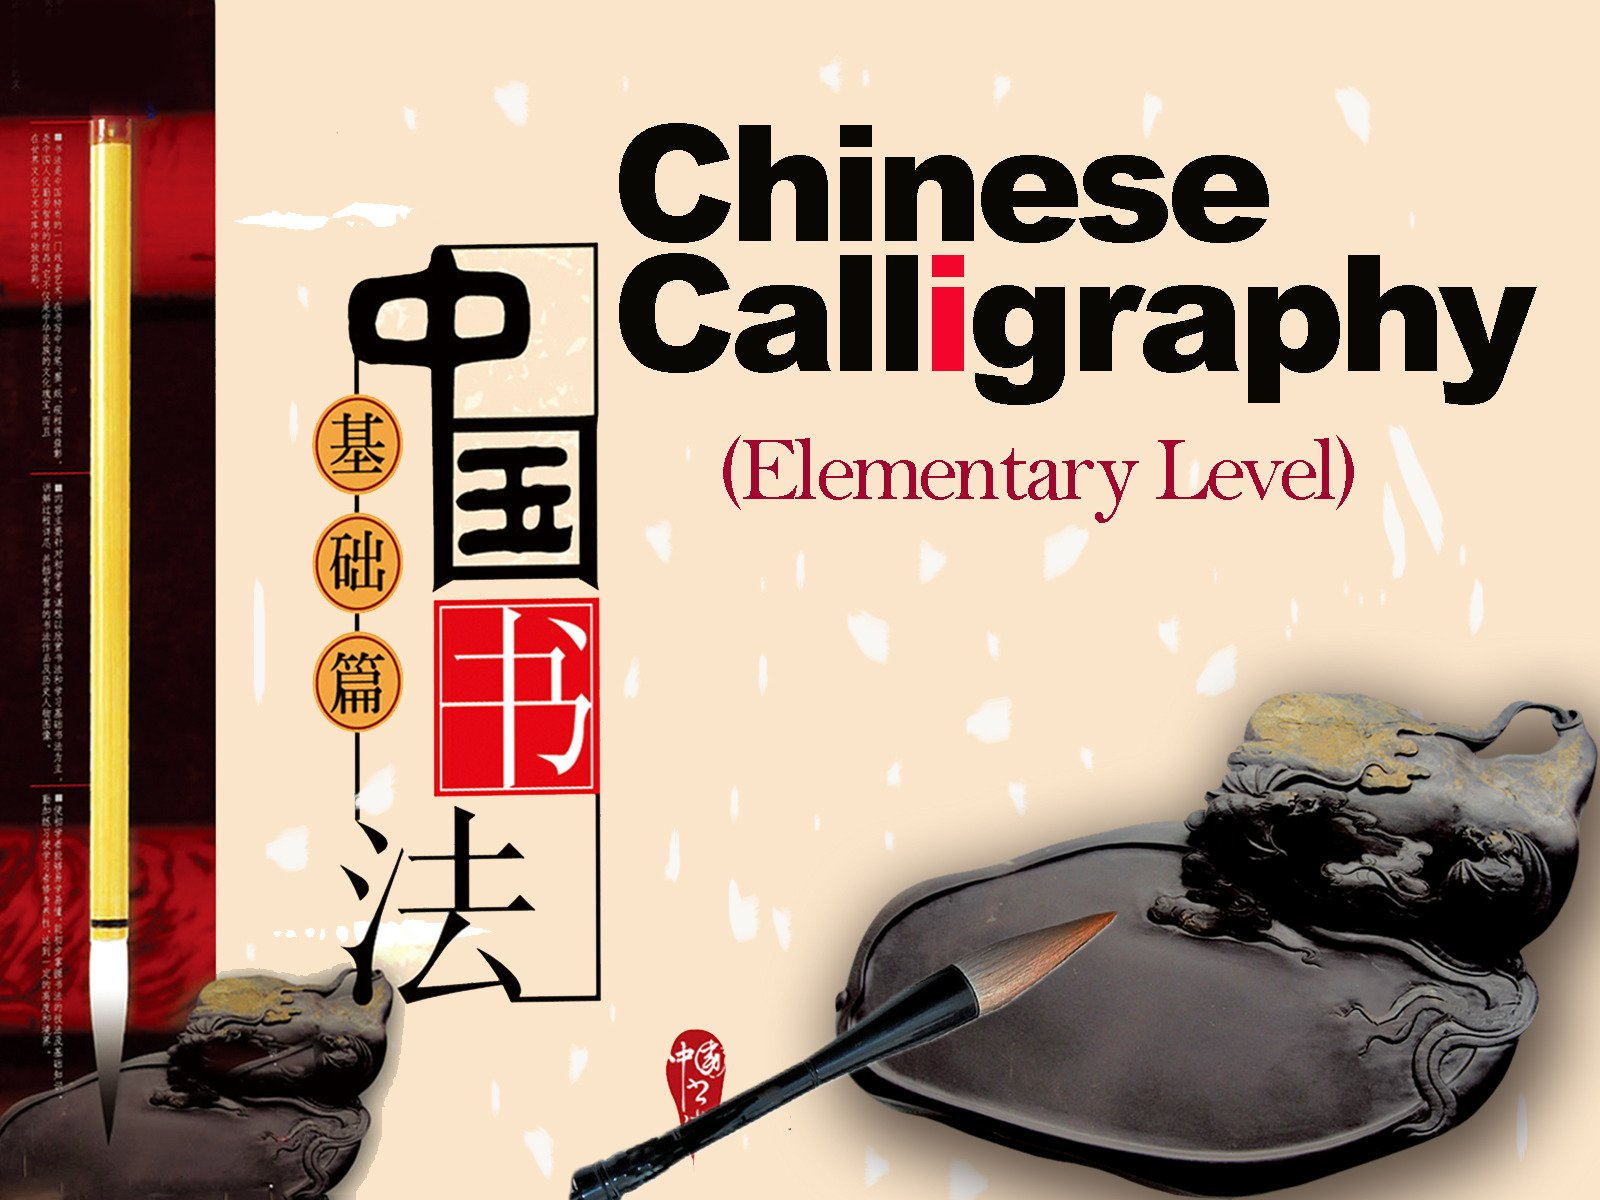 Chinese Calligraphy - Season 2